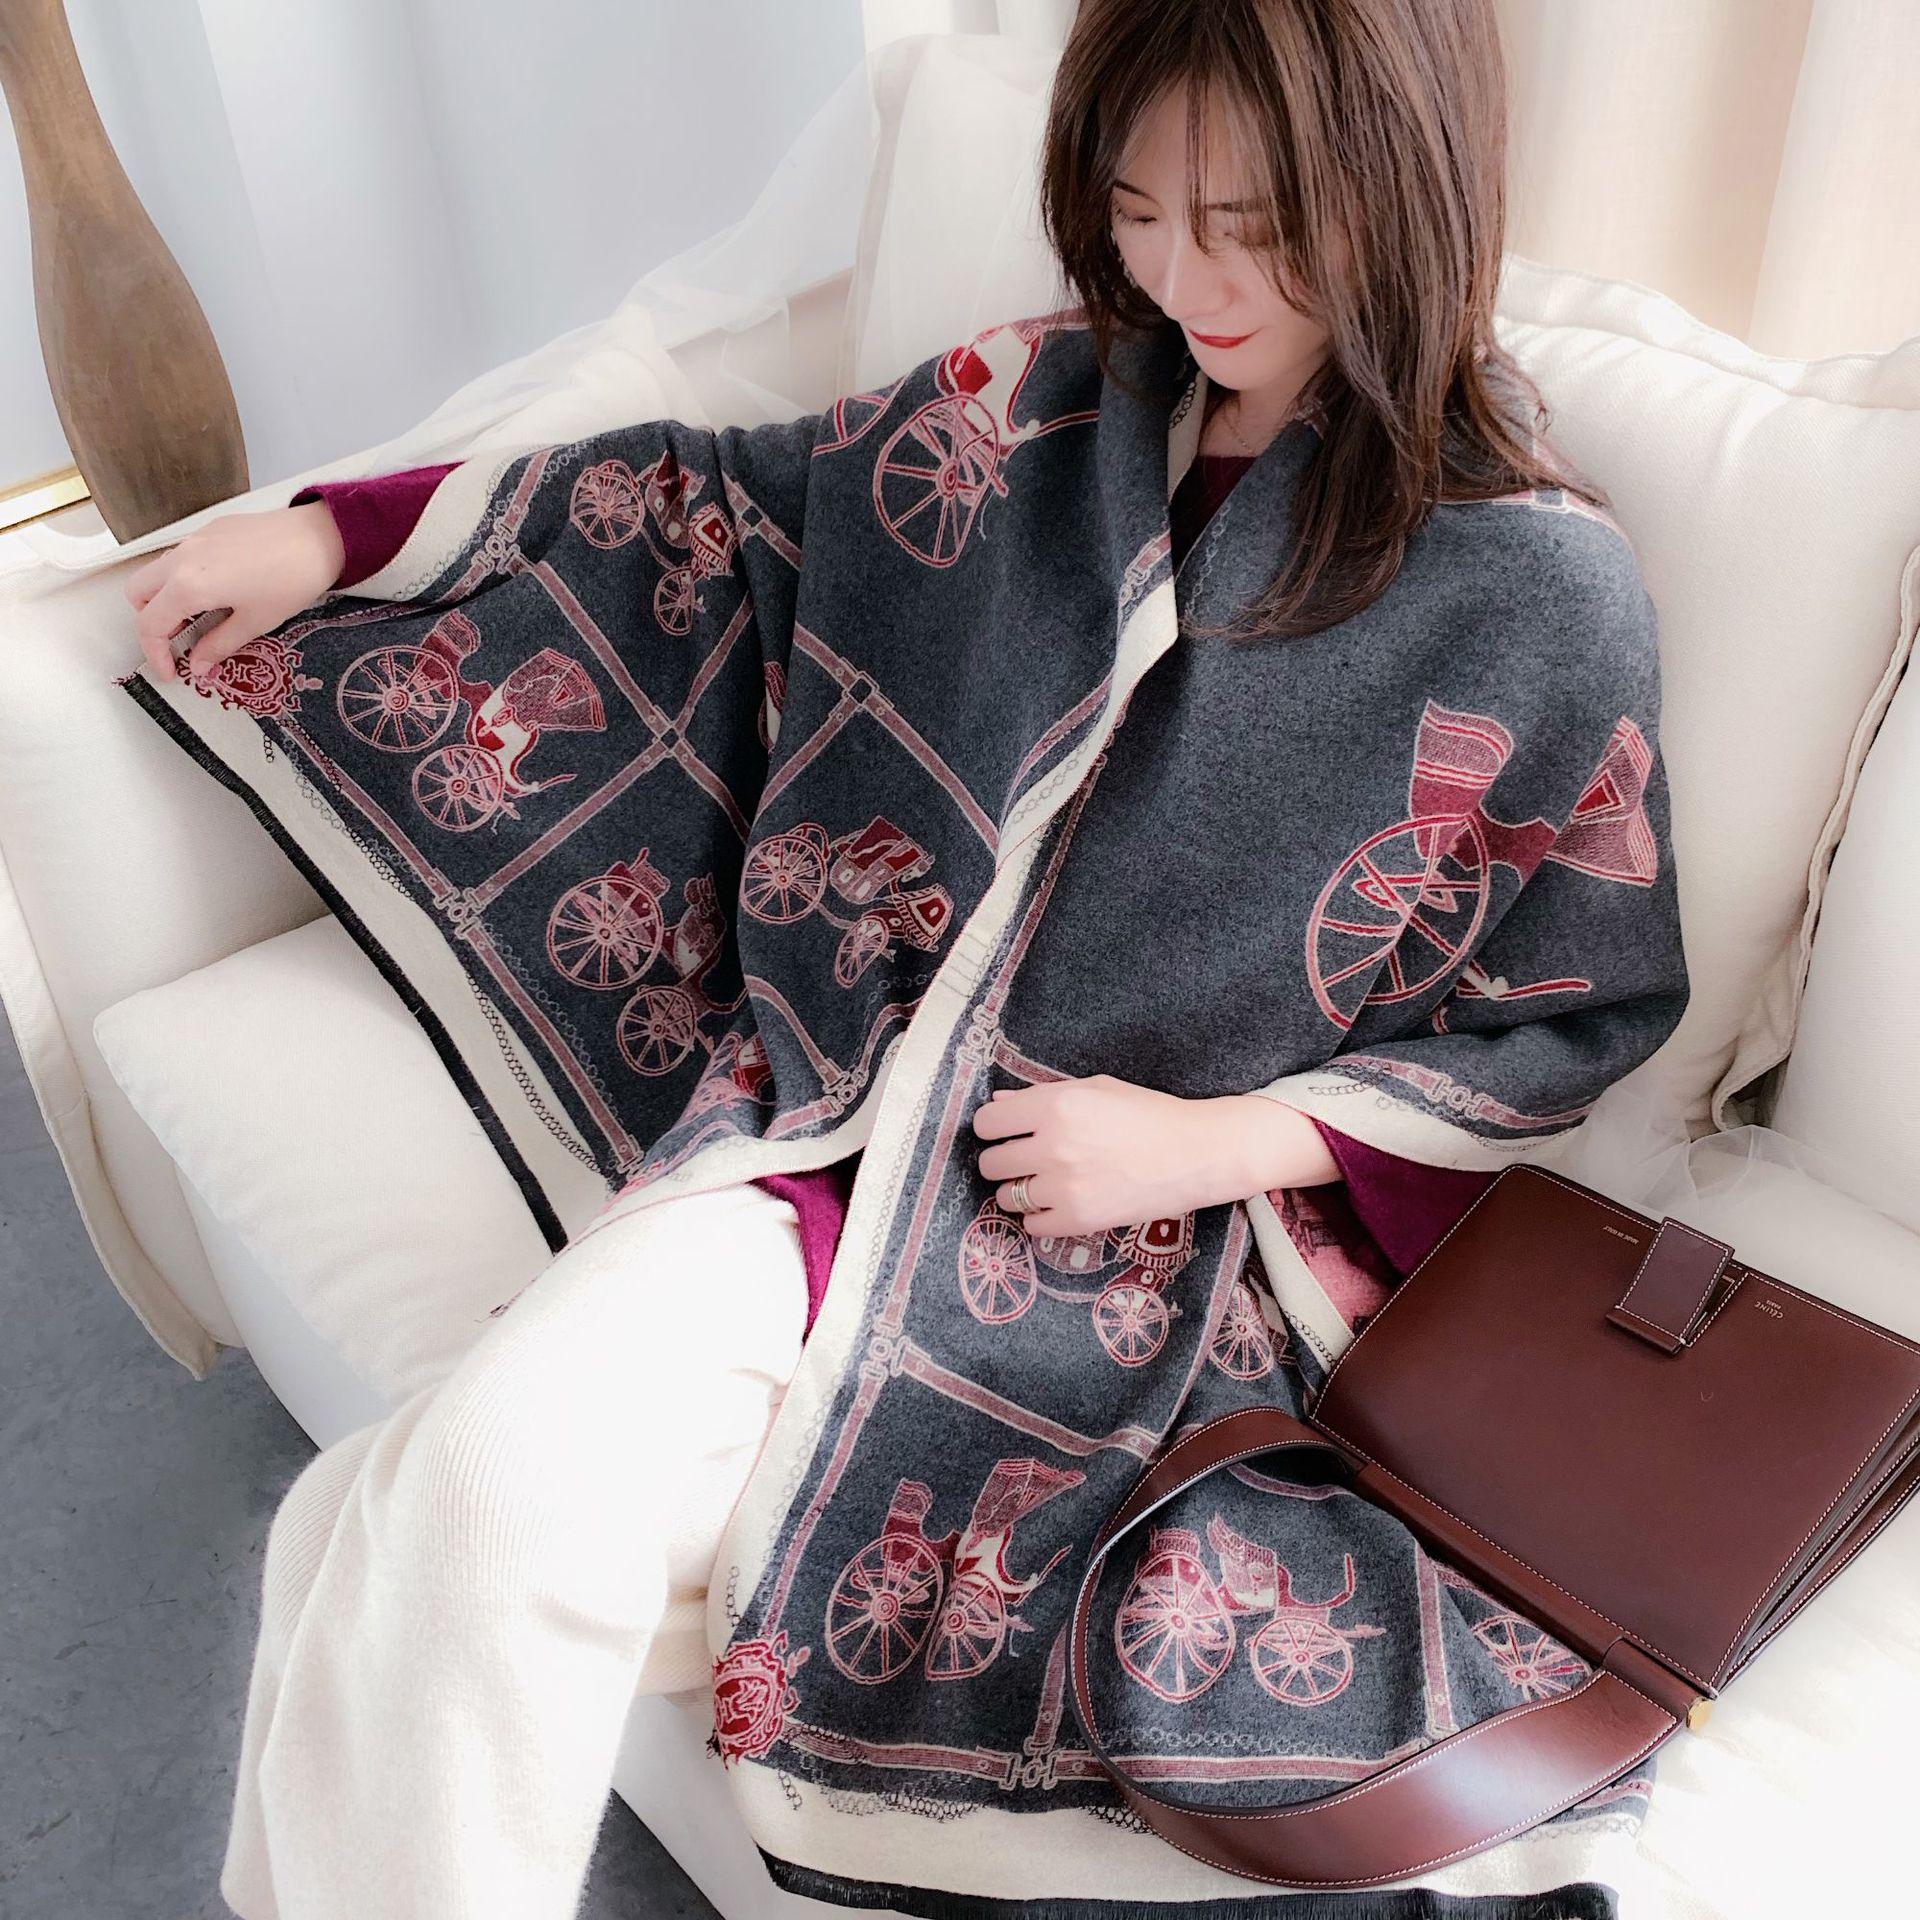 Large Size Cashmere Brushed Scarf for Lady Pashmina Shawls Wraps Thick Women Warm Winter Scarves Luxury Brand Bufanda 2020 New